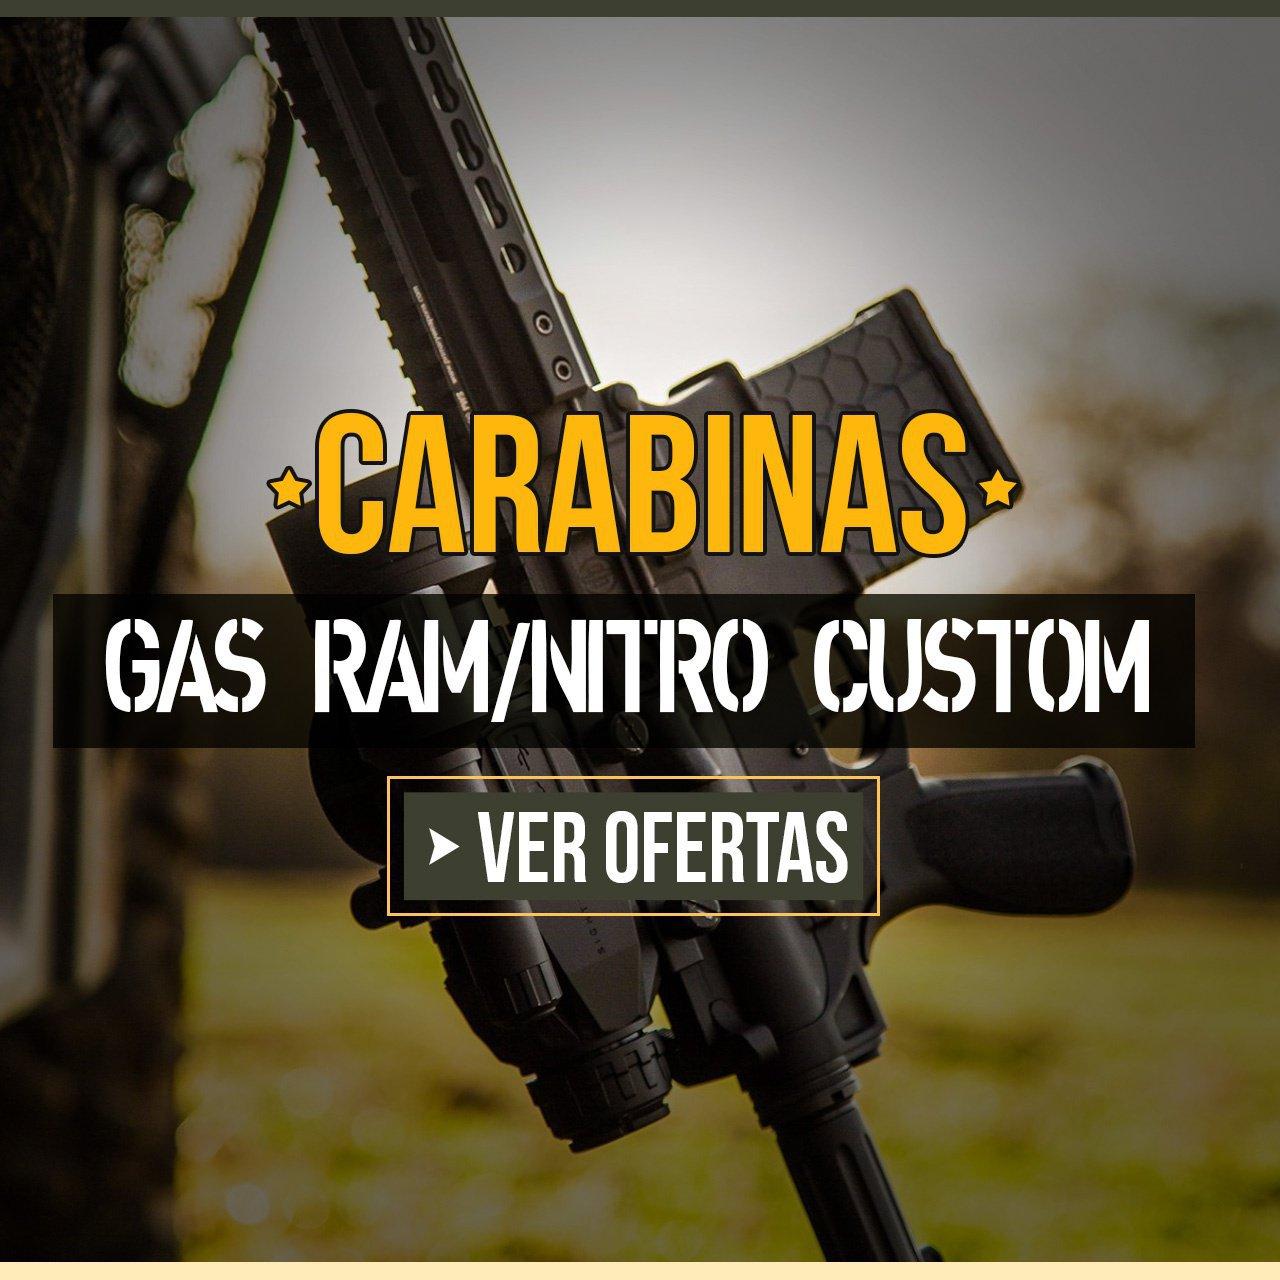 CARABINAS GAS RAM/NITRO CUSTOM